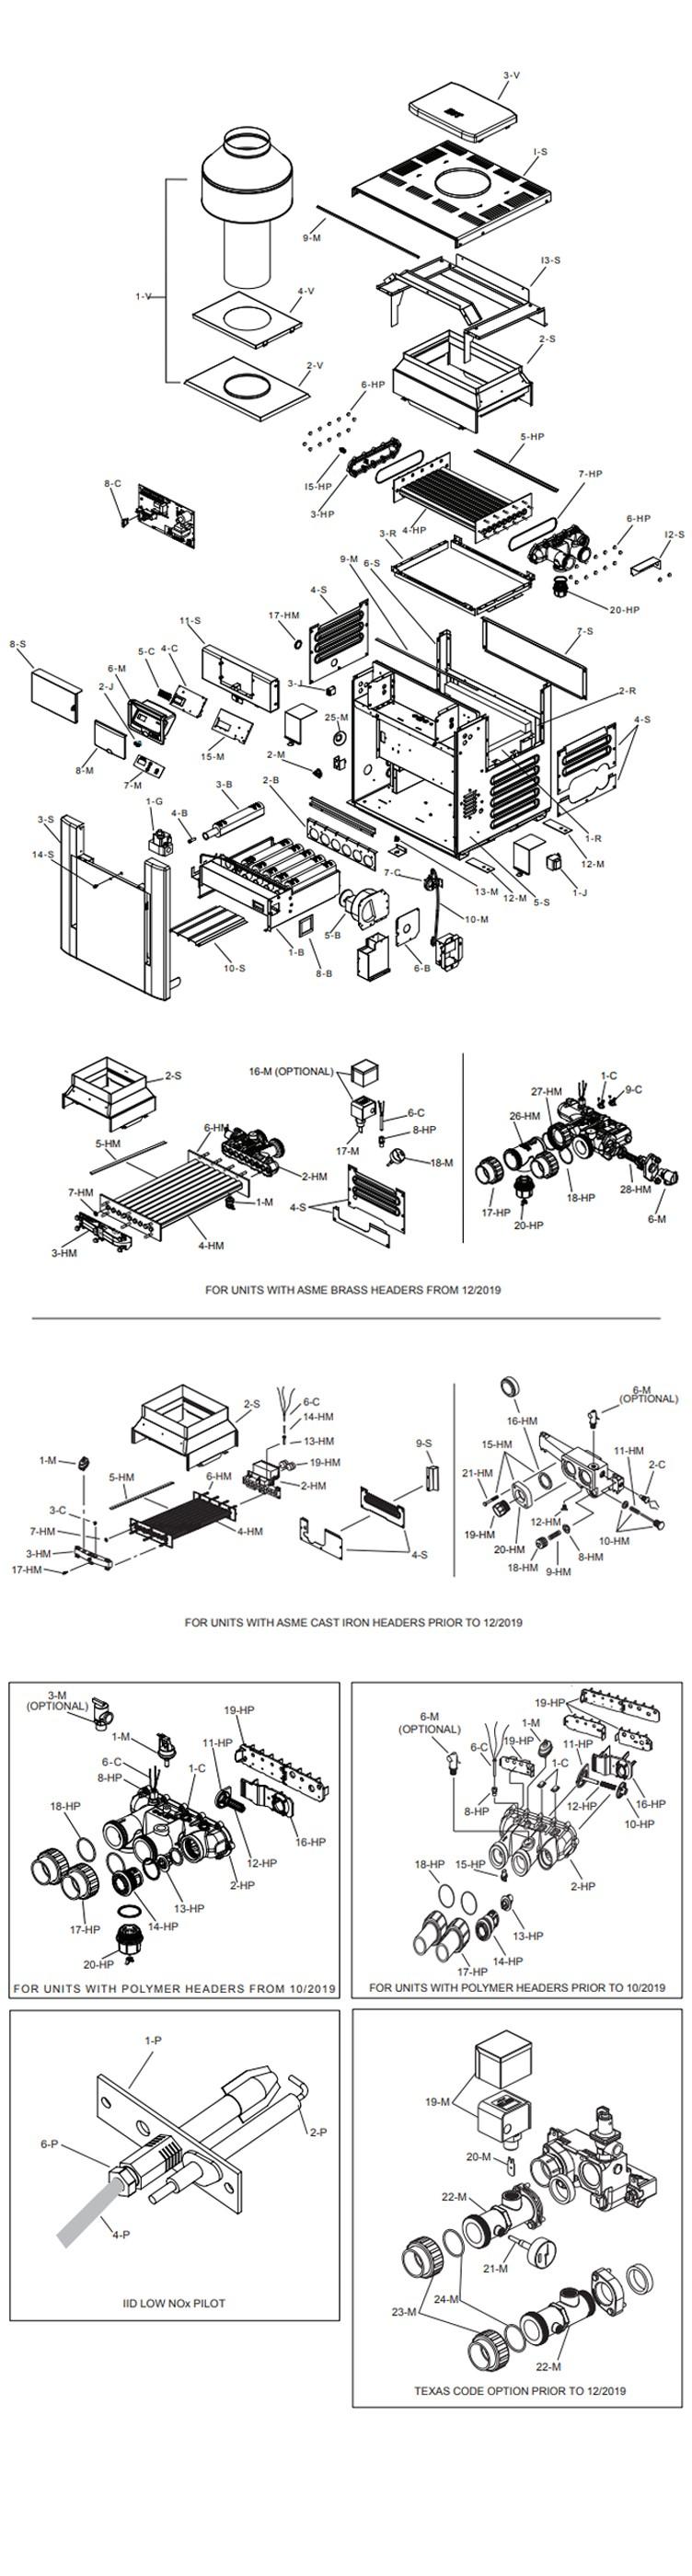 Raypak Digital Low NOX ASME Certified Natural Gas Commercial Swimming Pool Heater 399k BTU   C-R407A-EN-C 009295 Parts Schematic